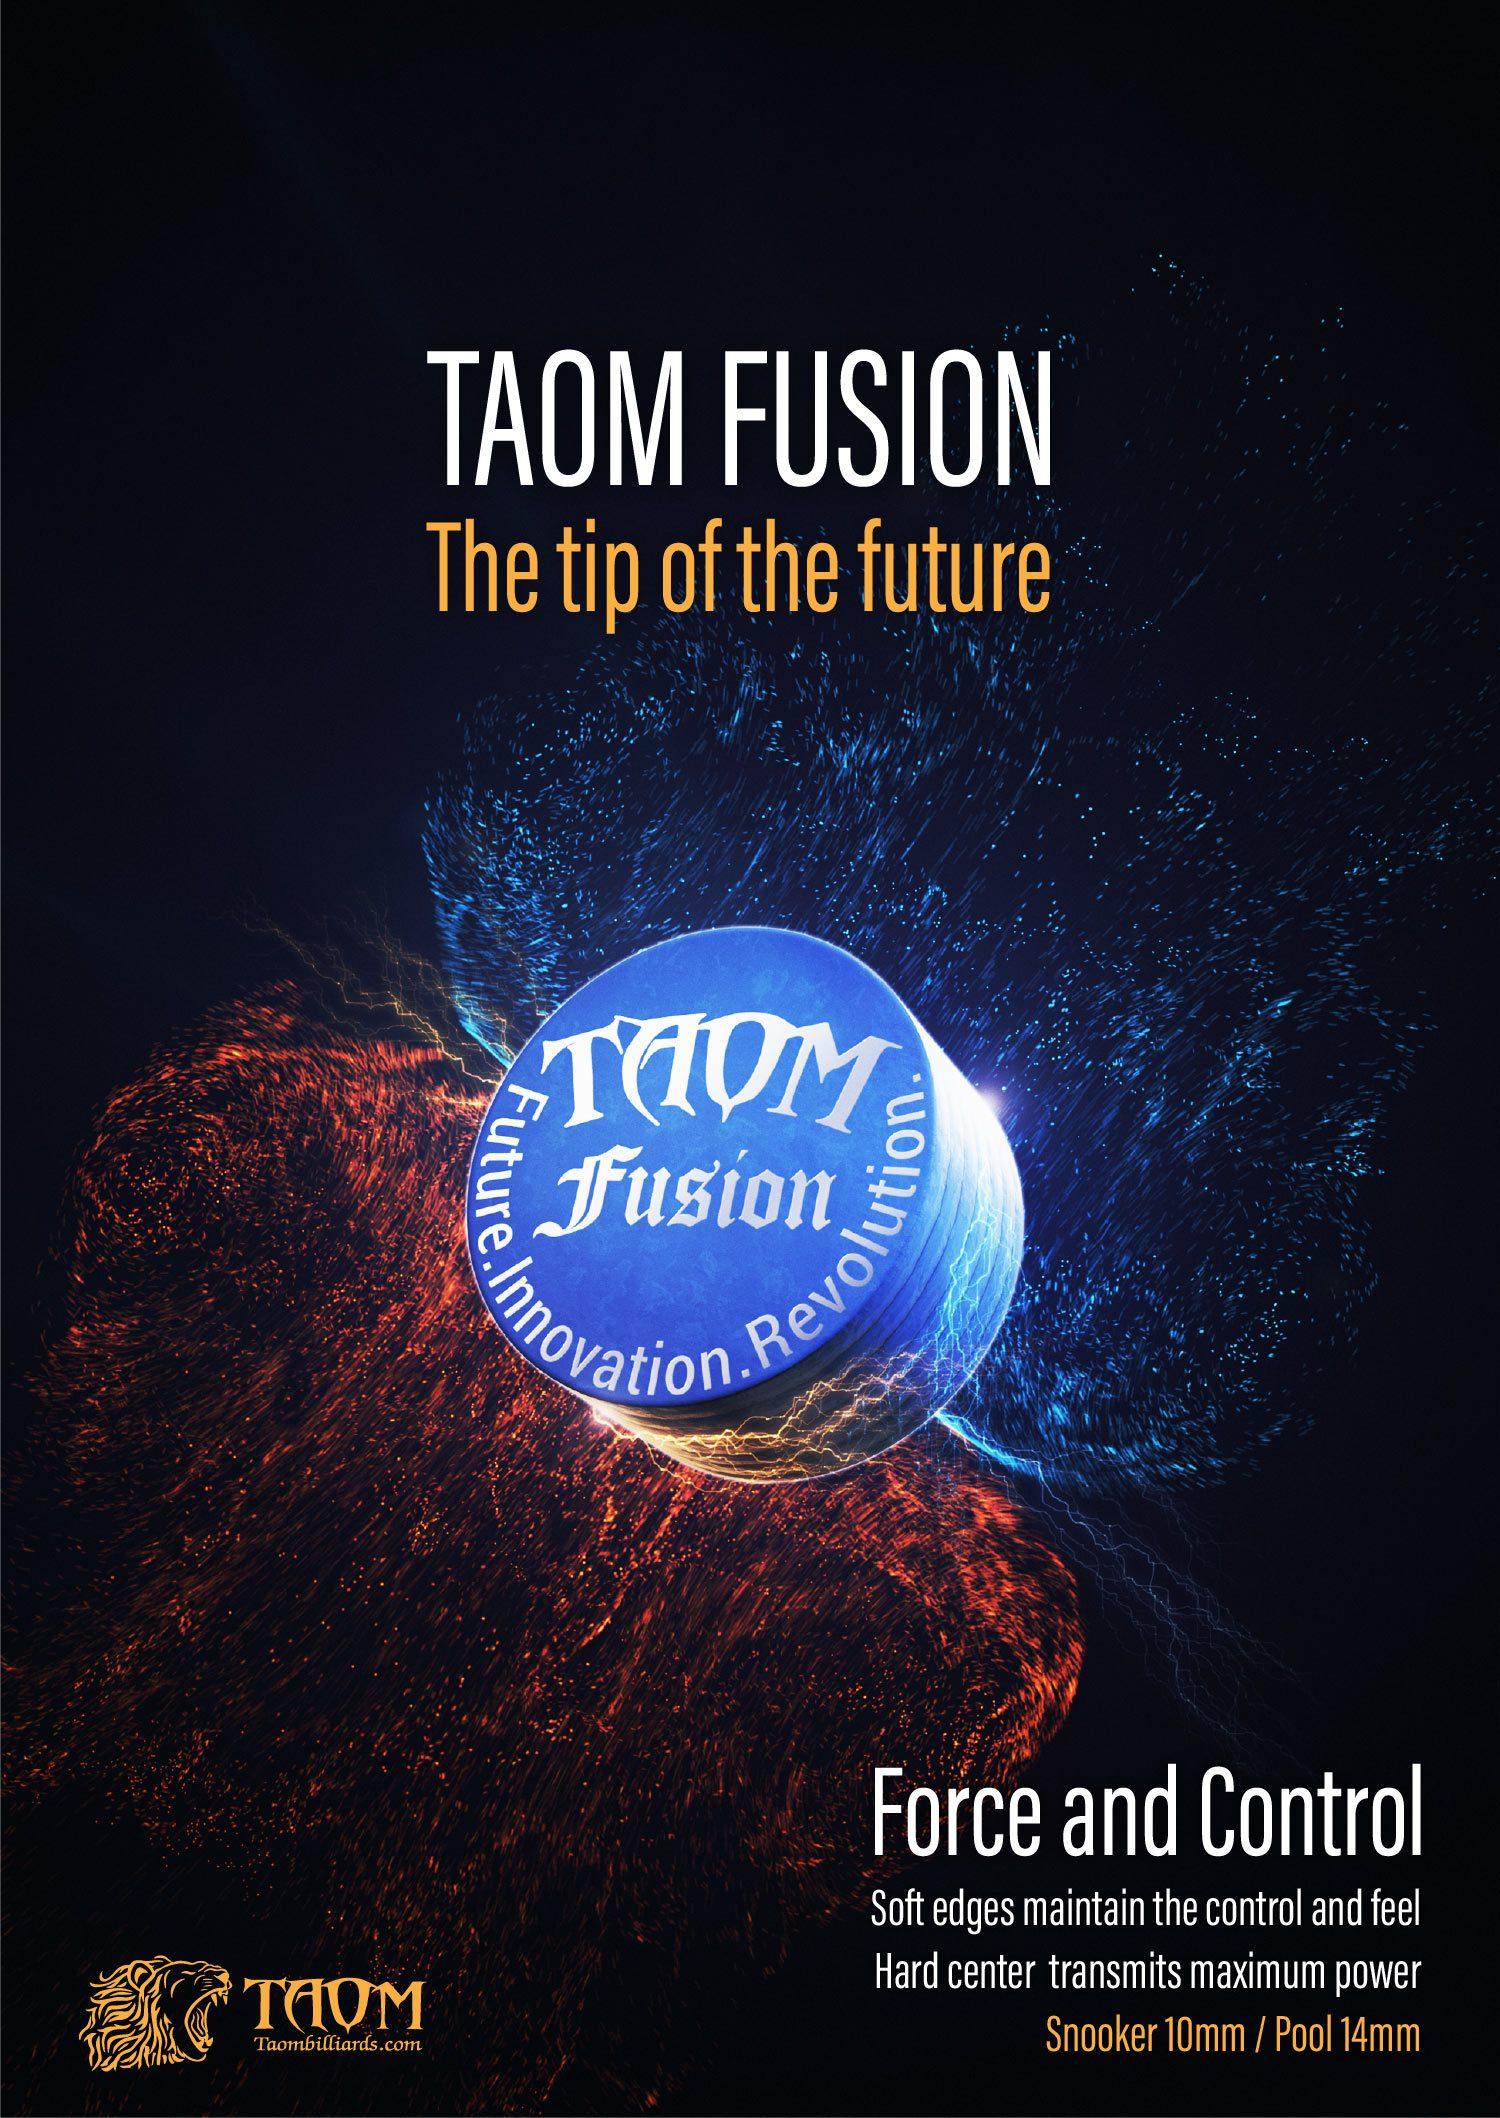 Taom Fusion